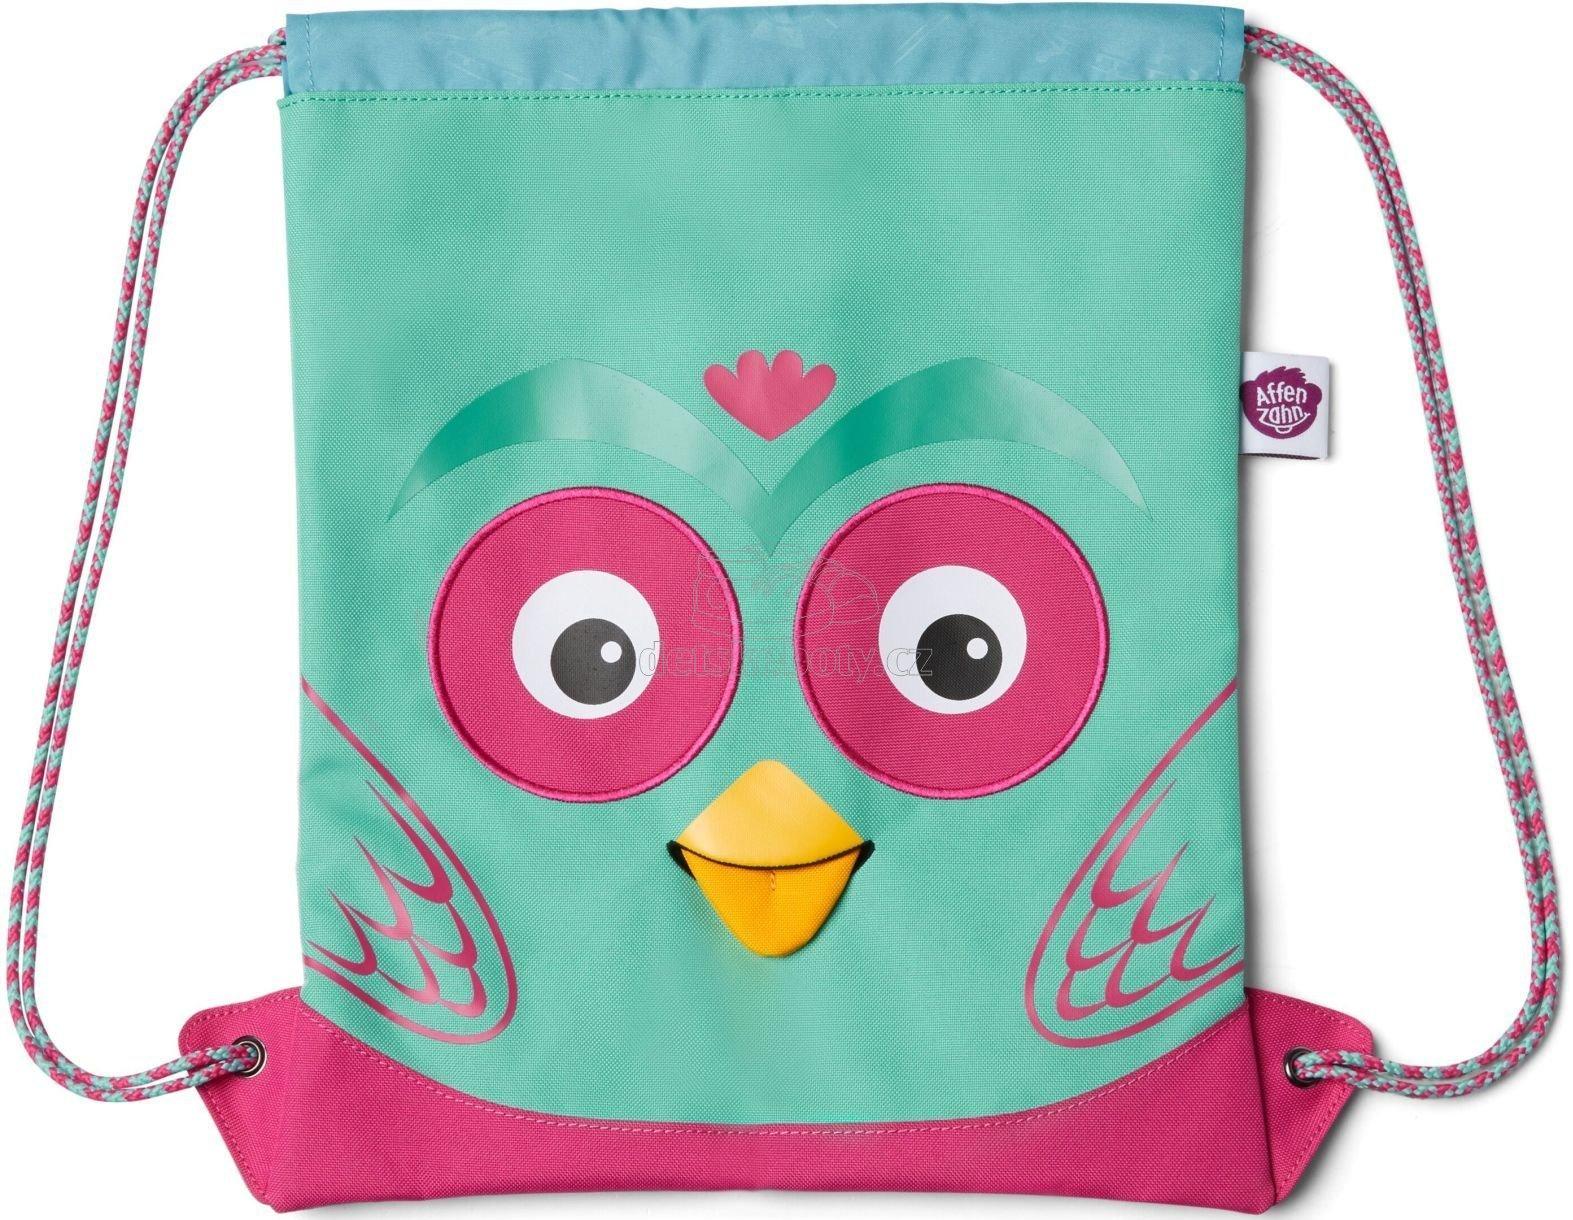 Dětský batůžek Affenzahn Kids Sportsbag Owl - turquoise